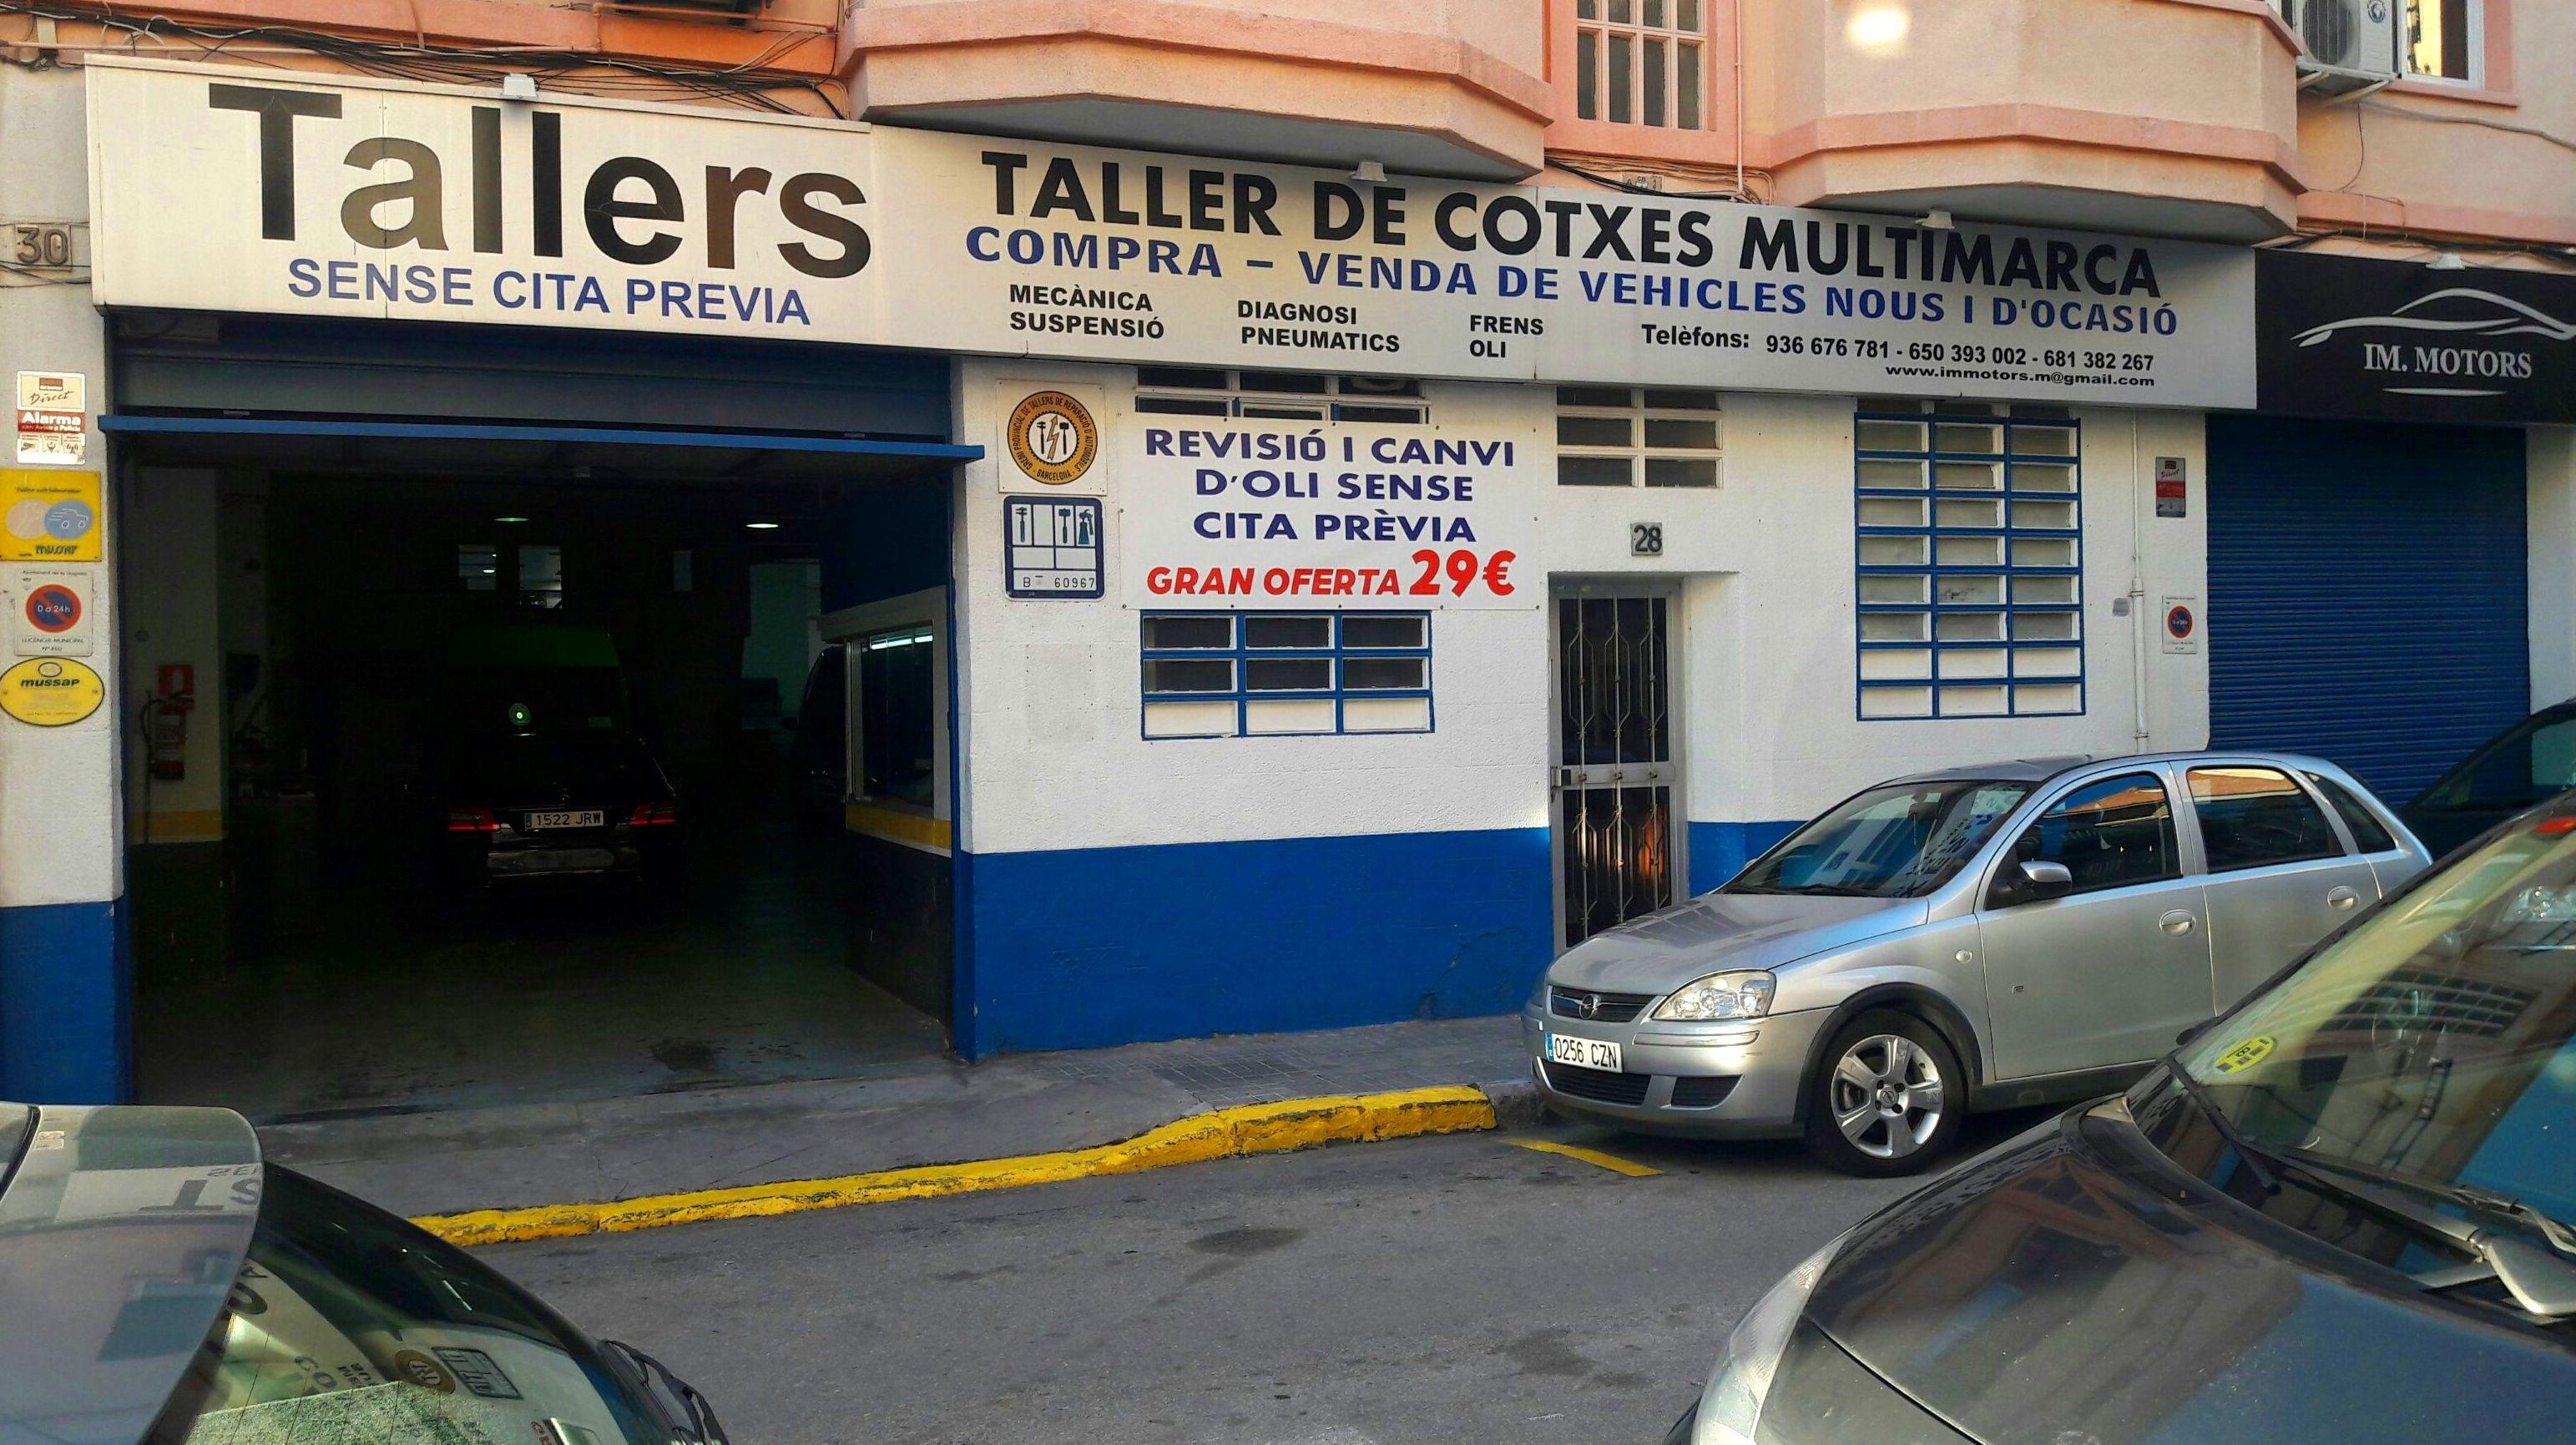 Foto 26 de Talleres de automóviles en La Llagosta | IM Motors